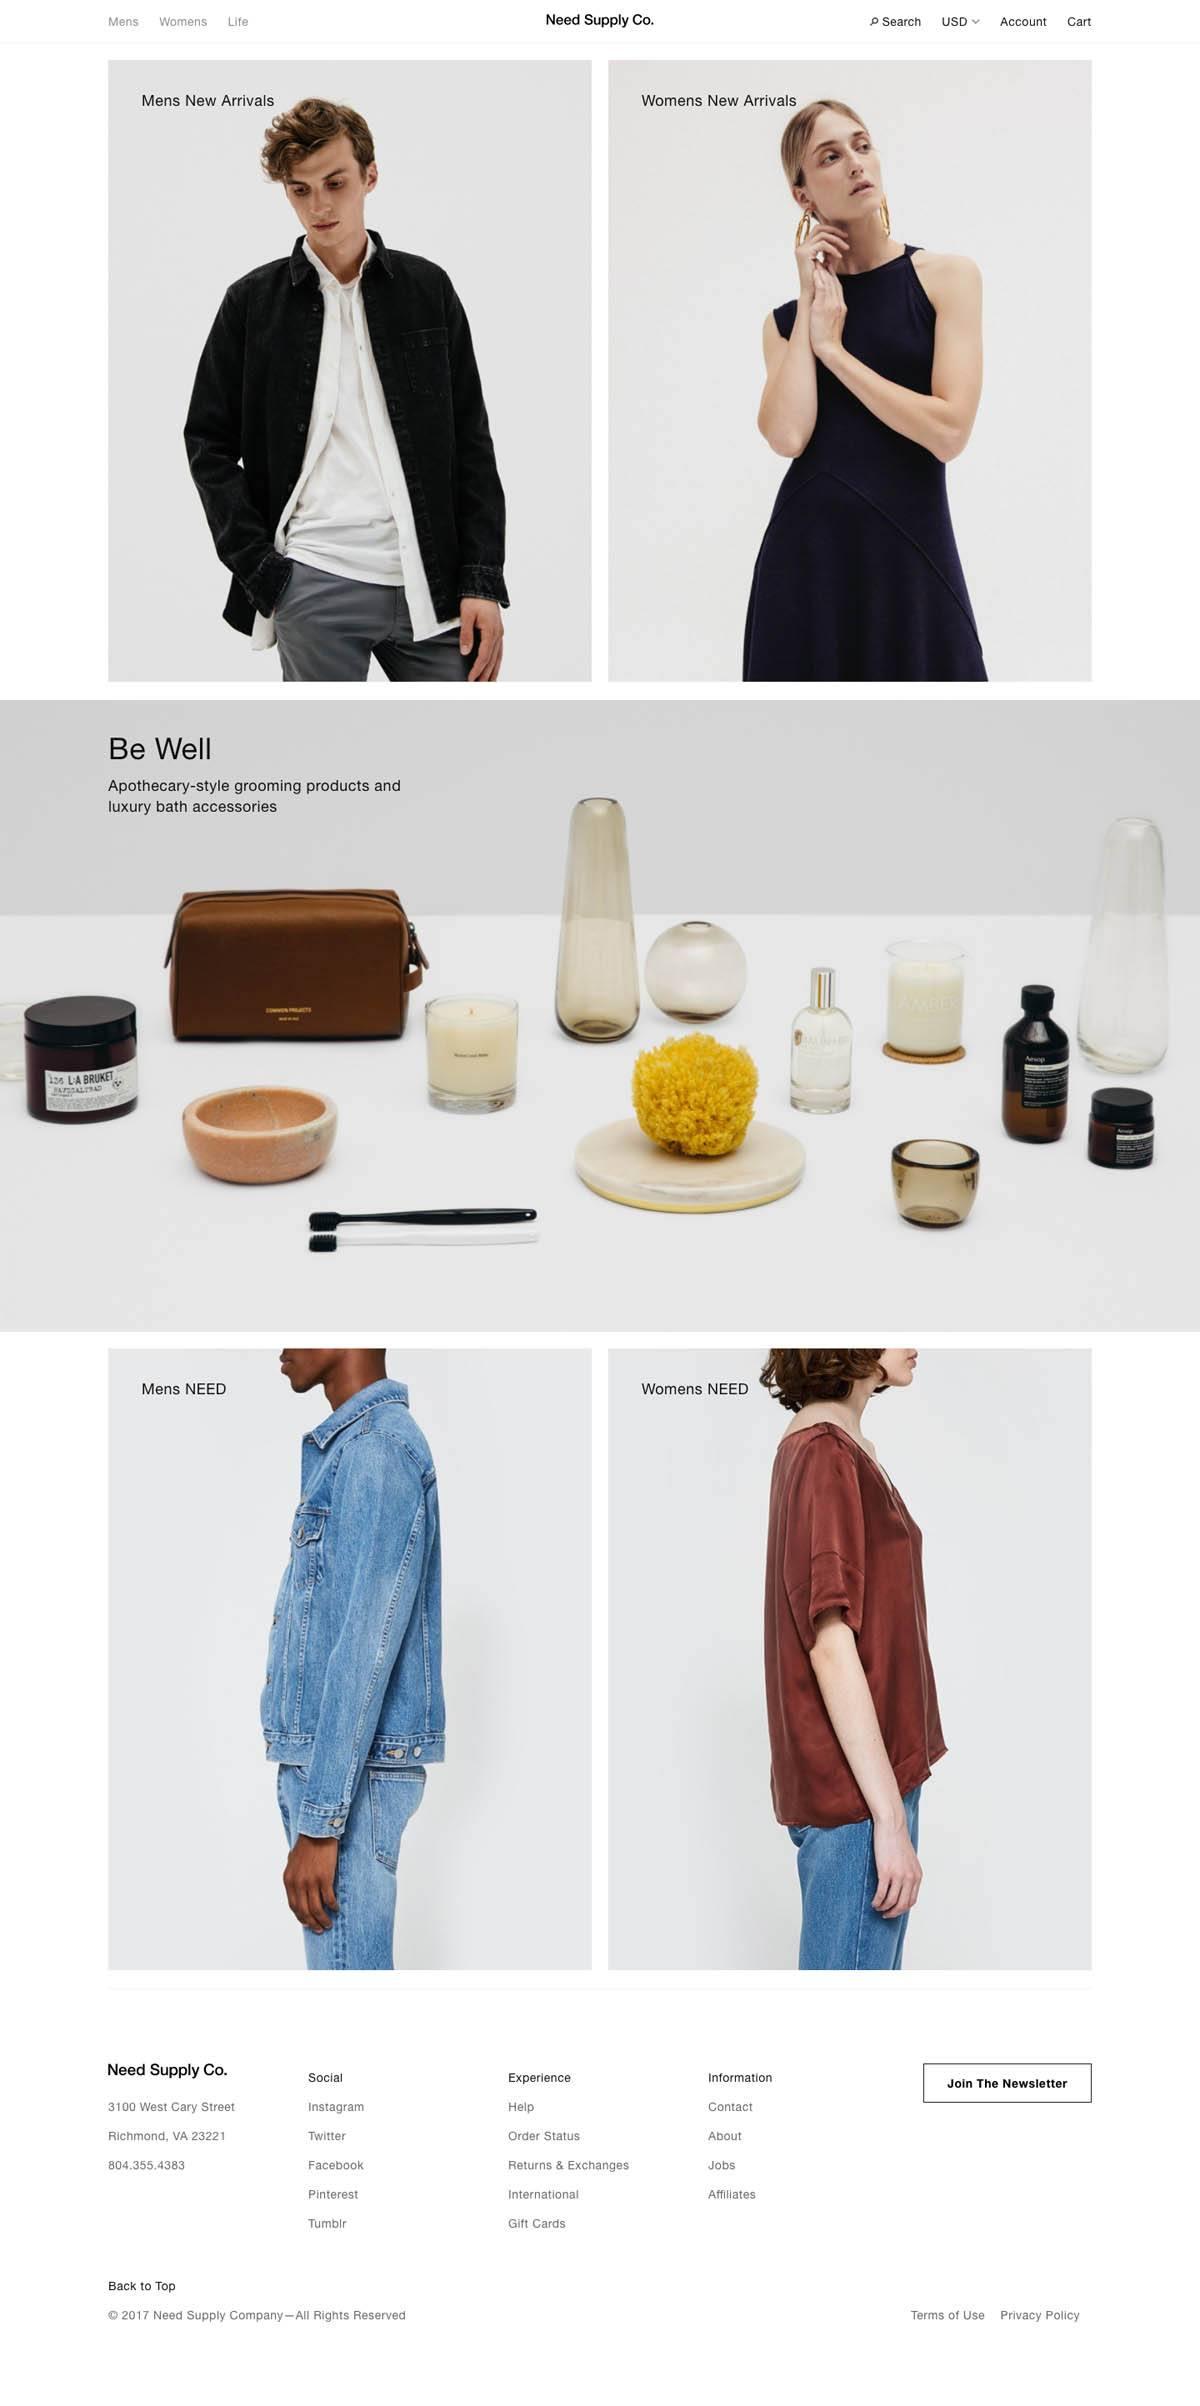 eCommerce website: Need Supply Co.